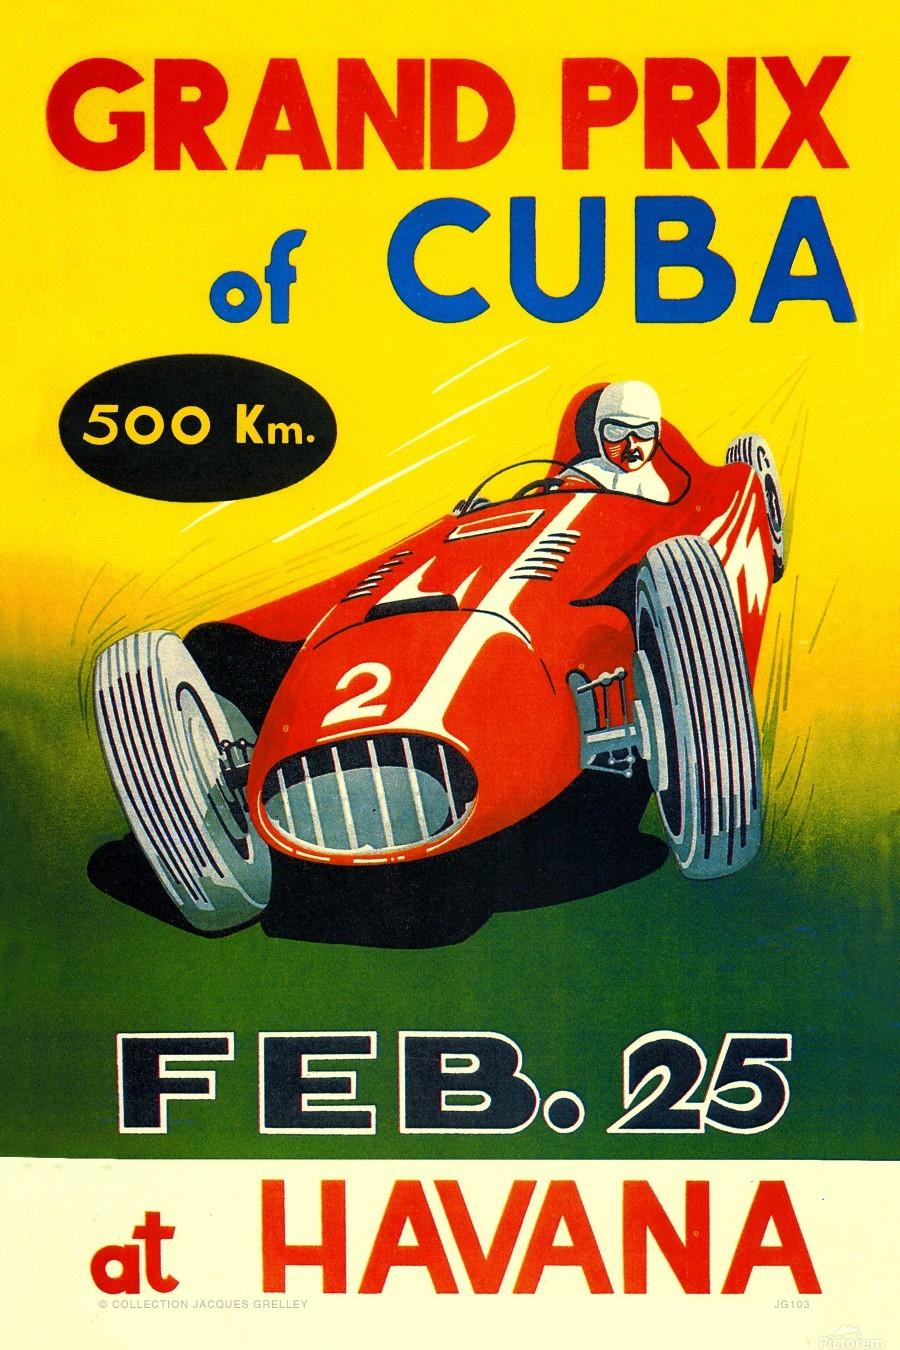 Cuba Grand Prix Havana 1958  Print